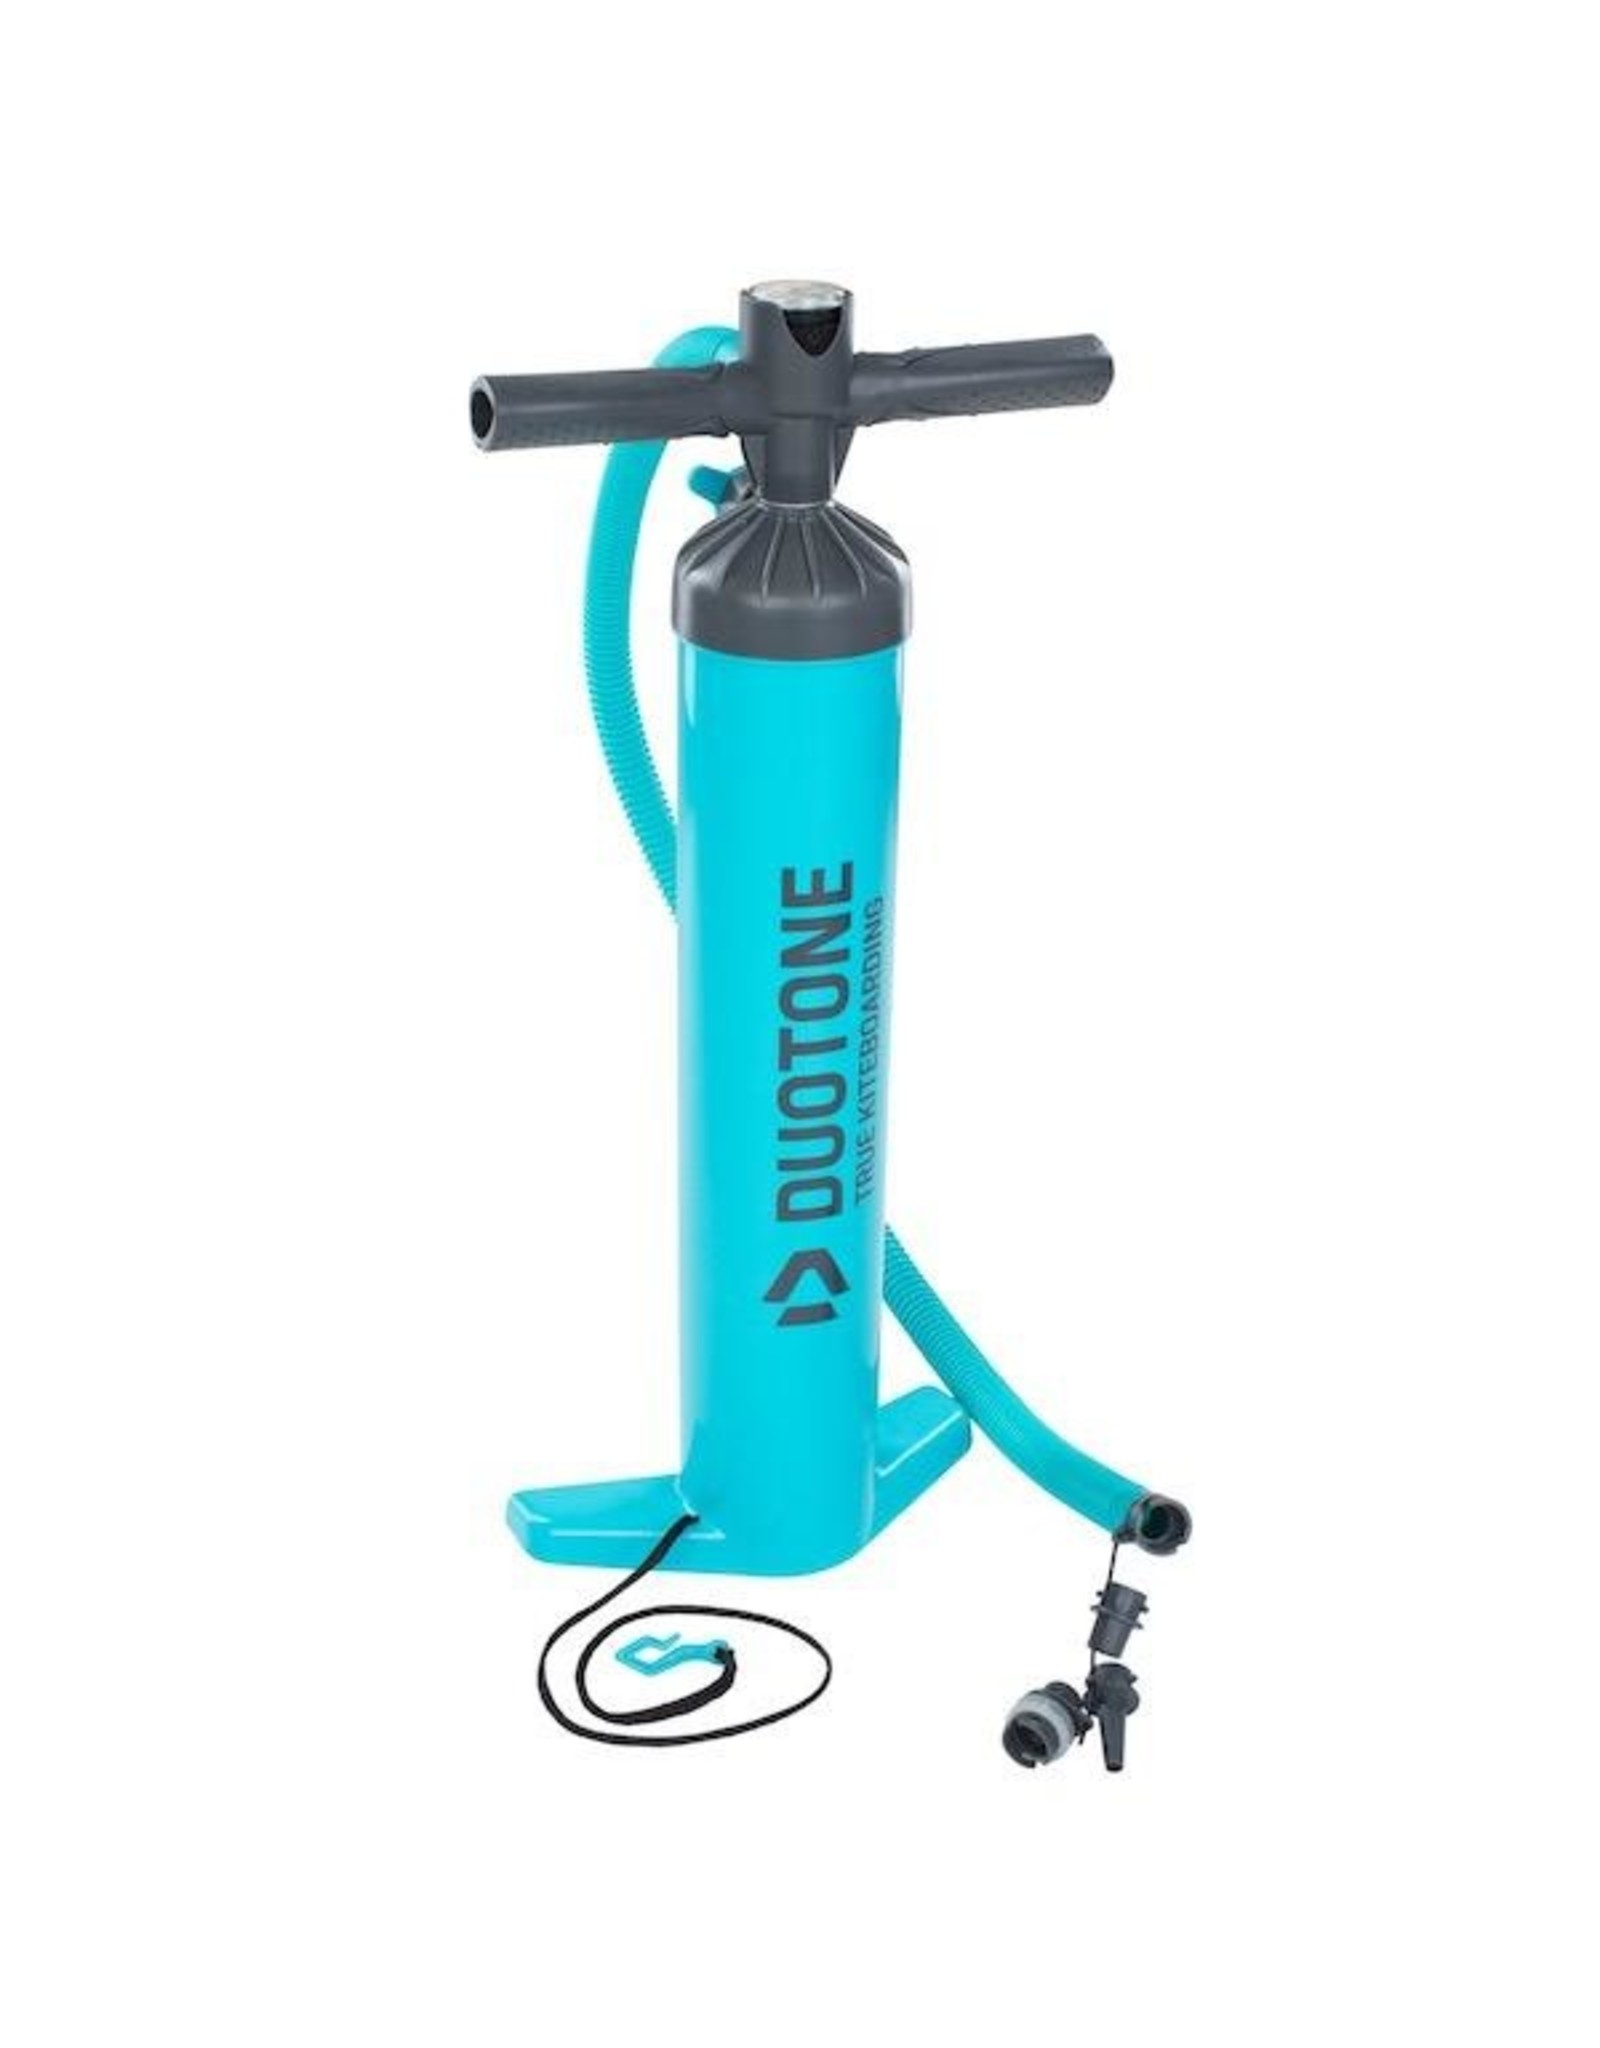 Duotone Duotone - Kite Pumpe - XL - 5,8Liter